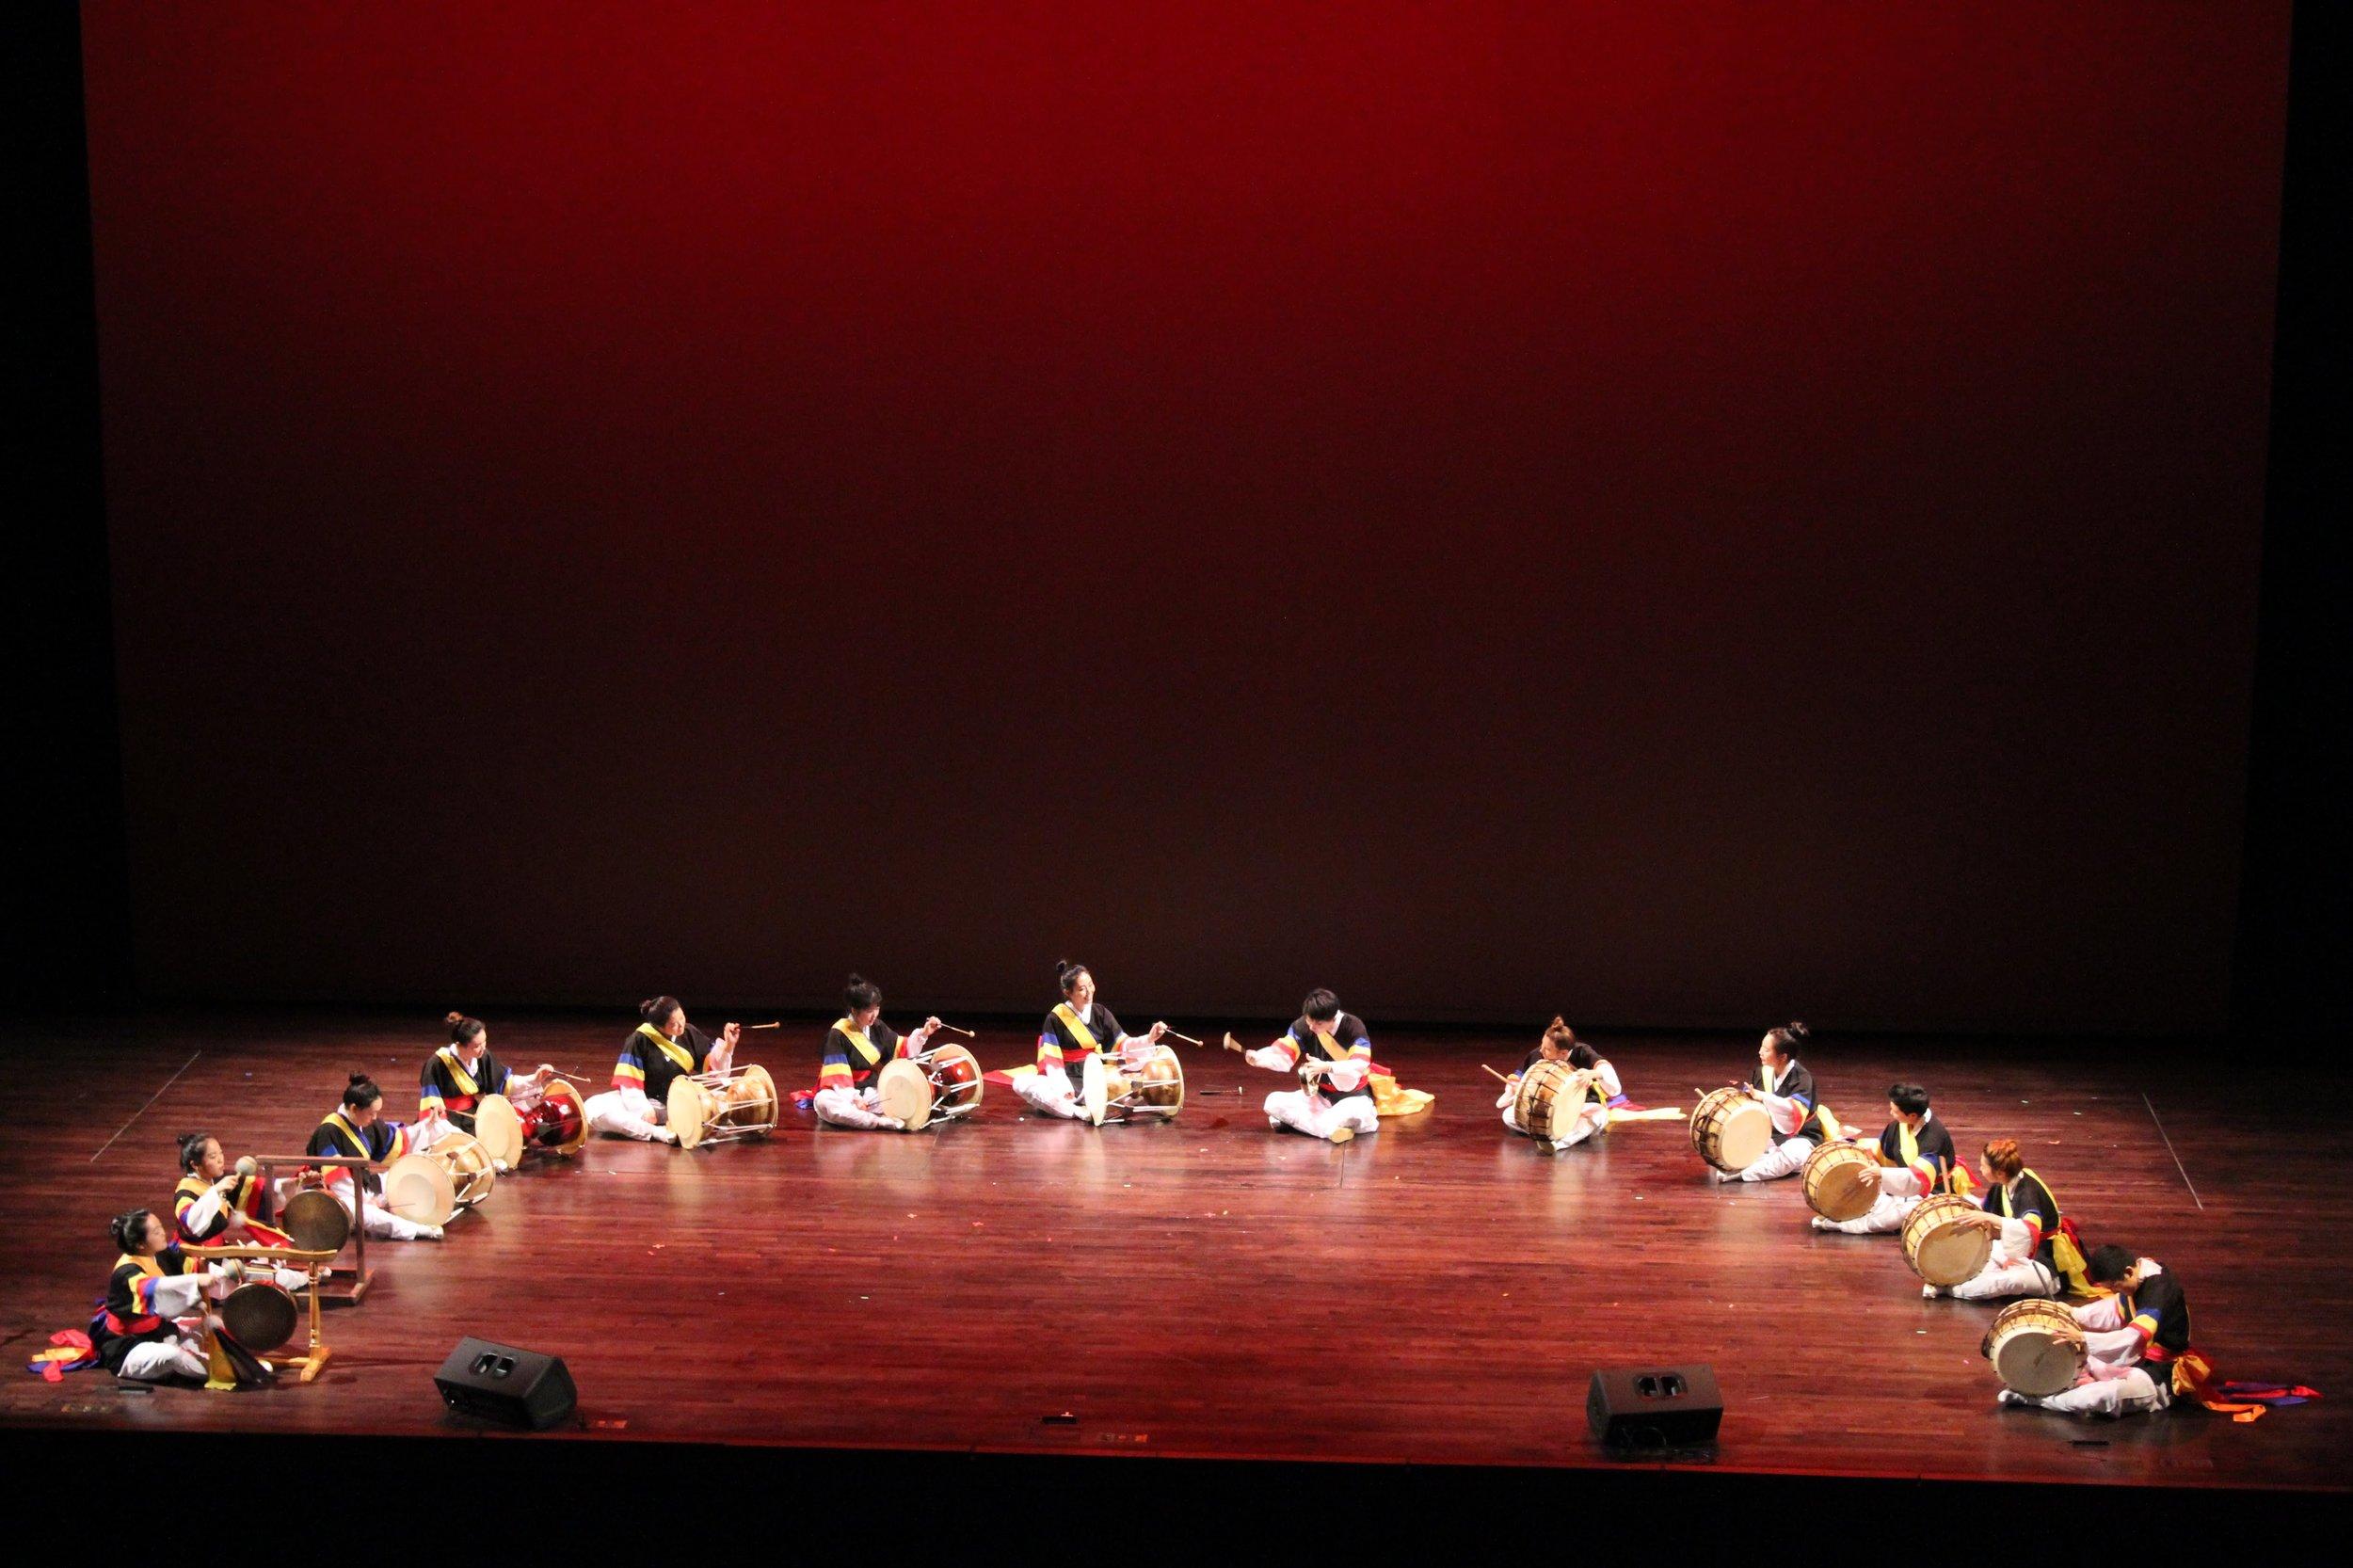 Hanwoollim at the CulturalFest Performance Showcase 2018